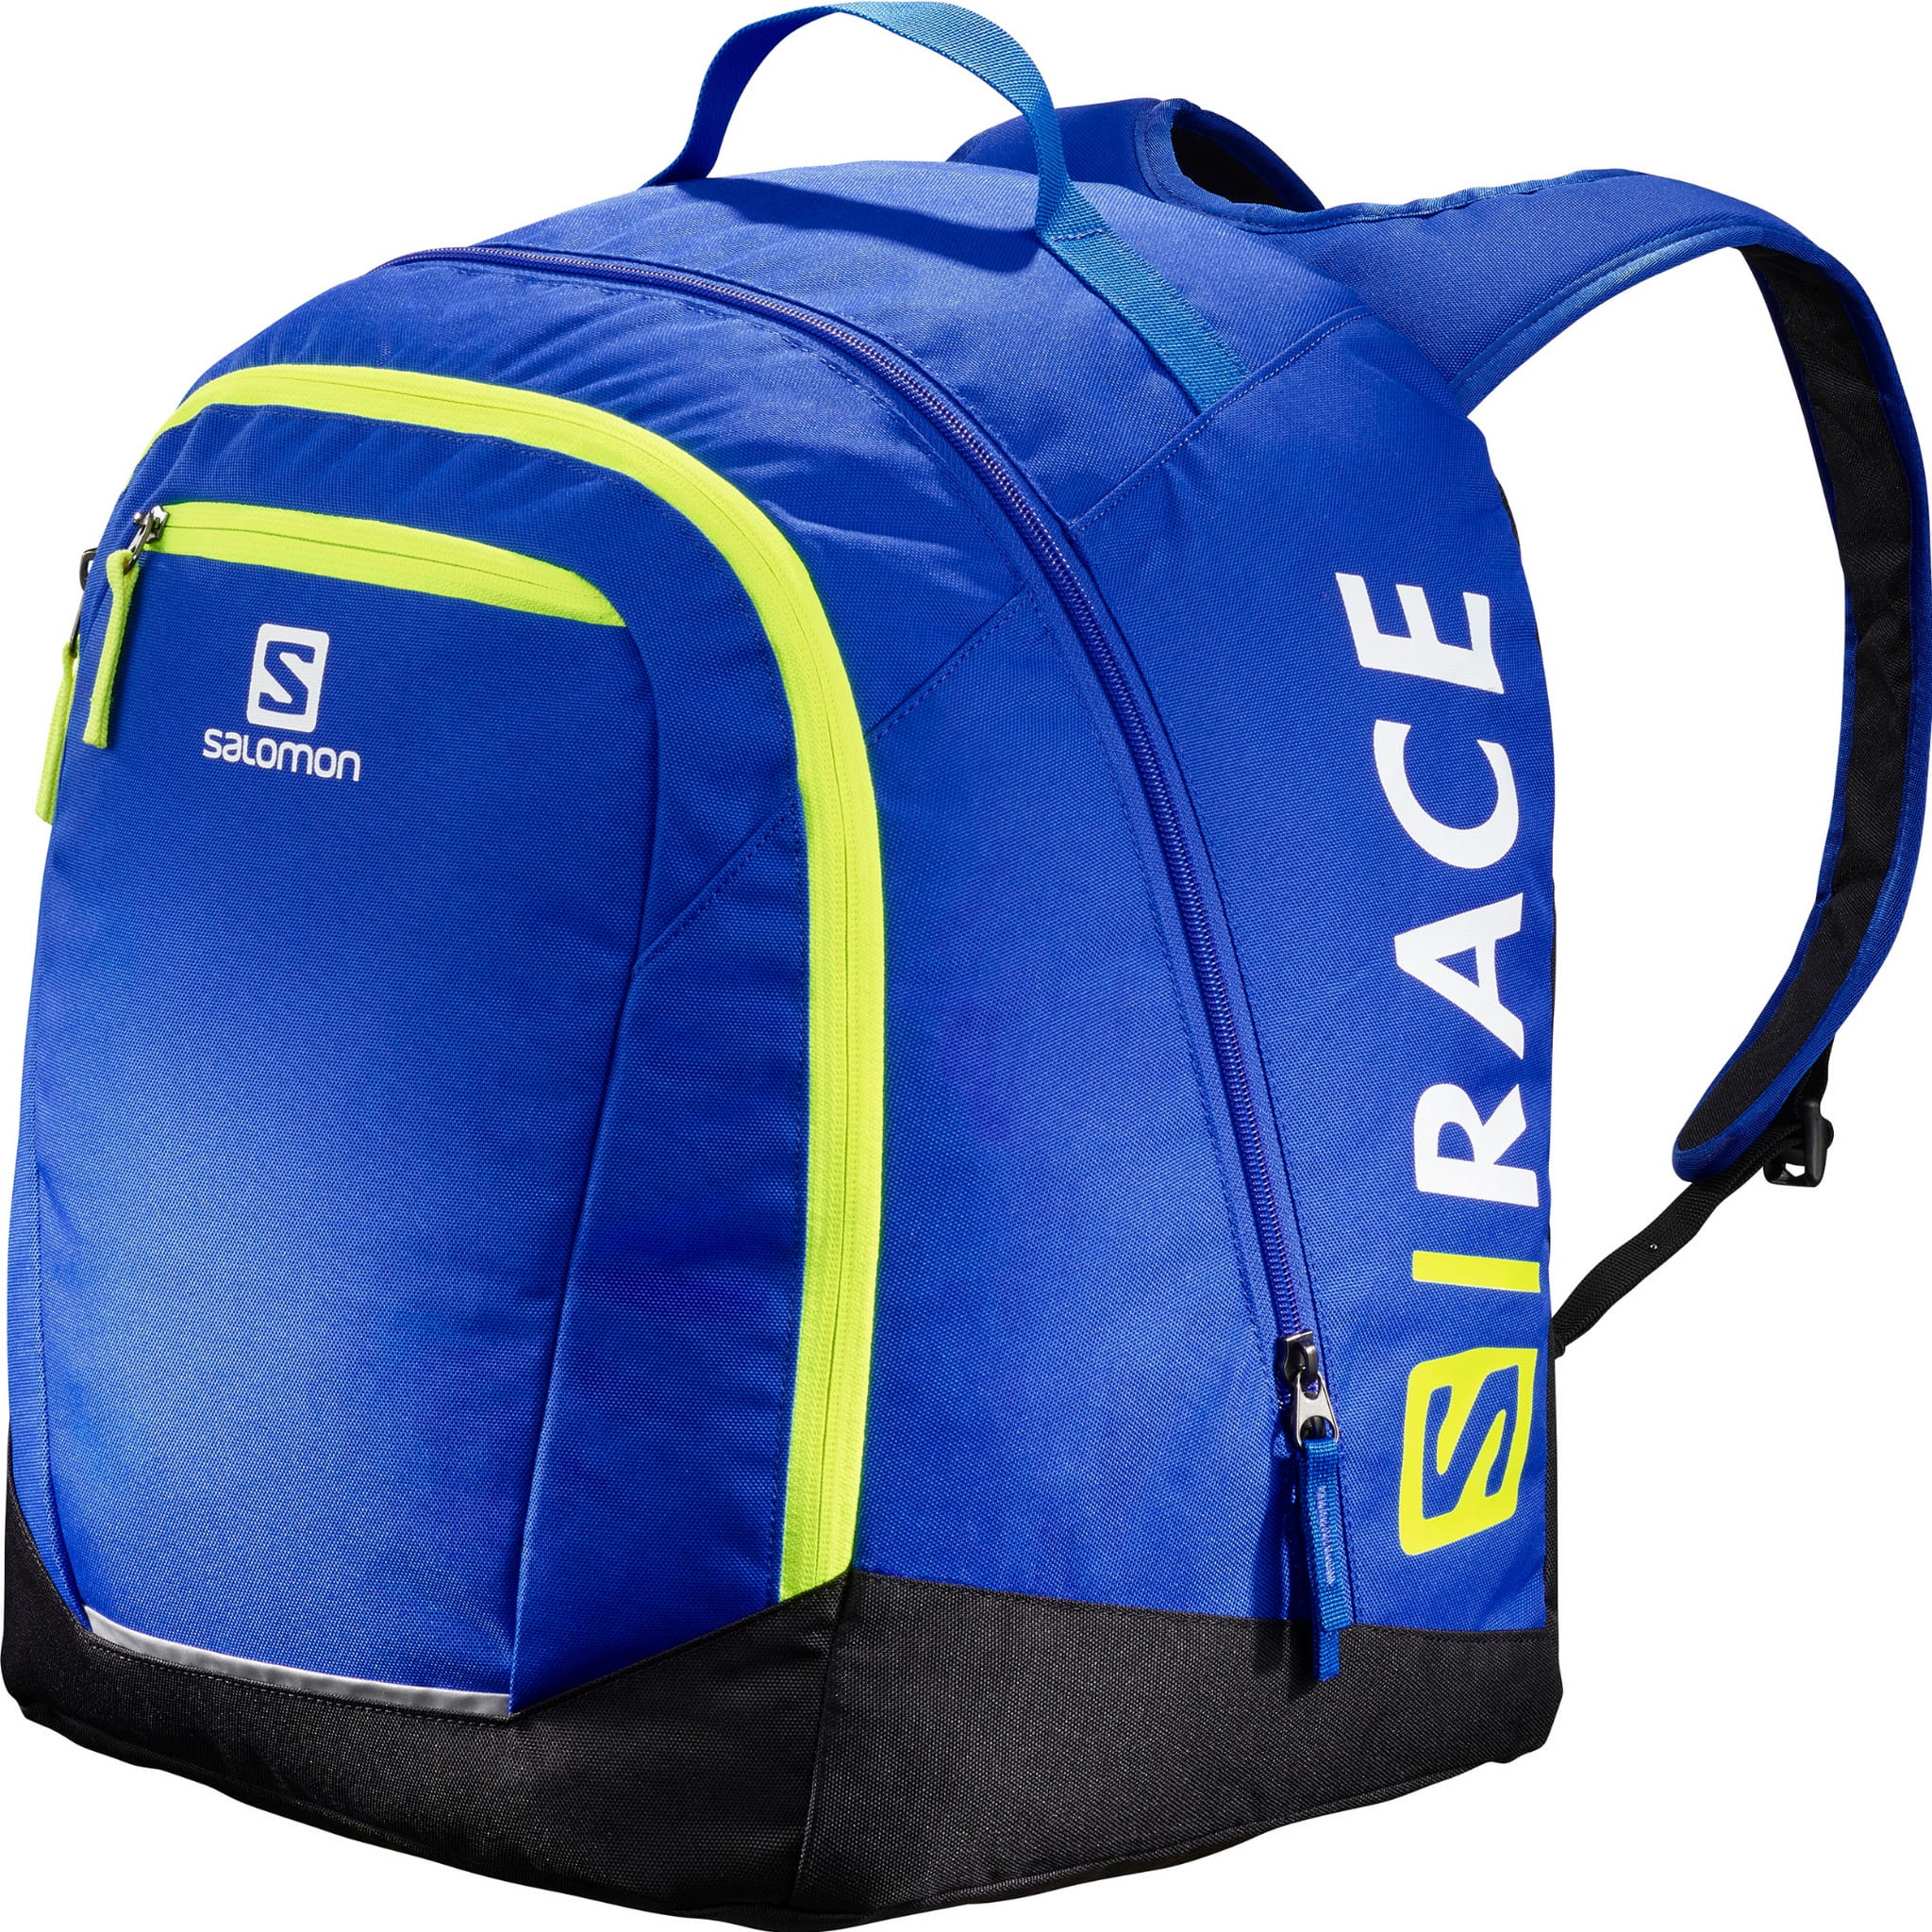 Pokrowiec plecak na buty Salomon original backpack